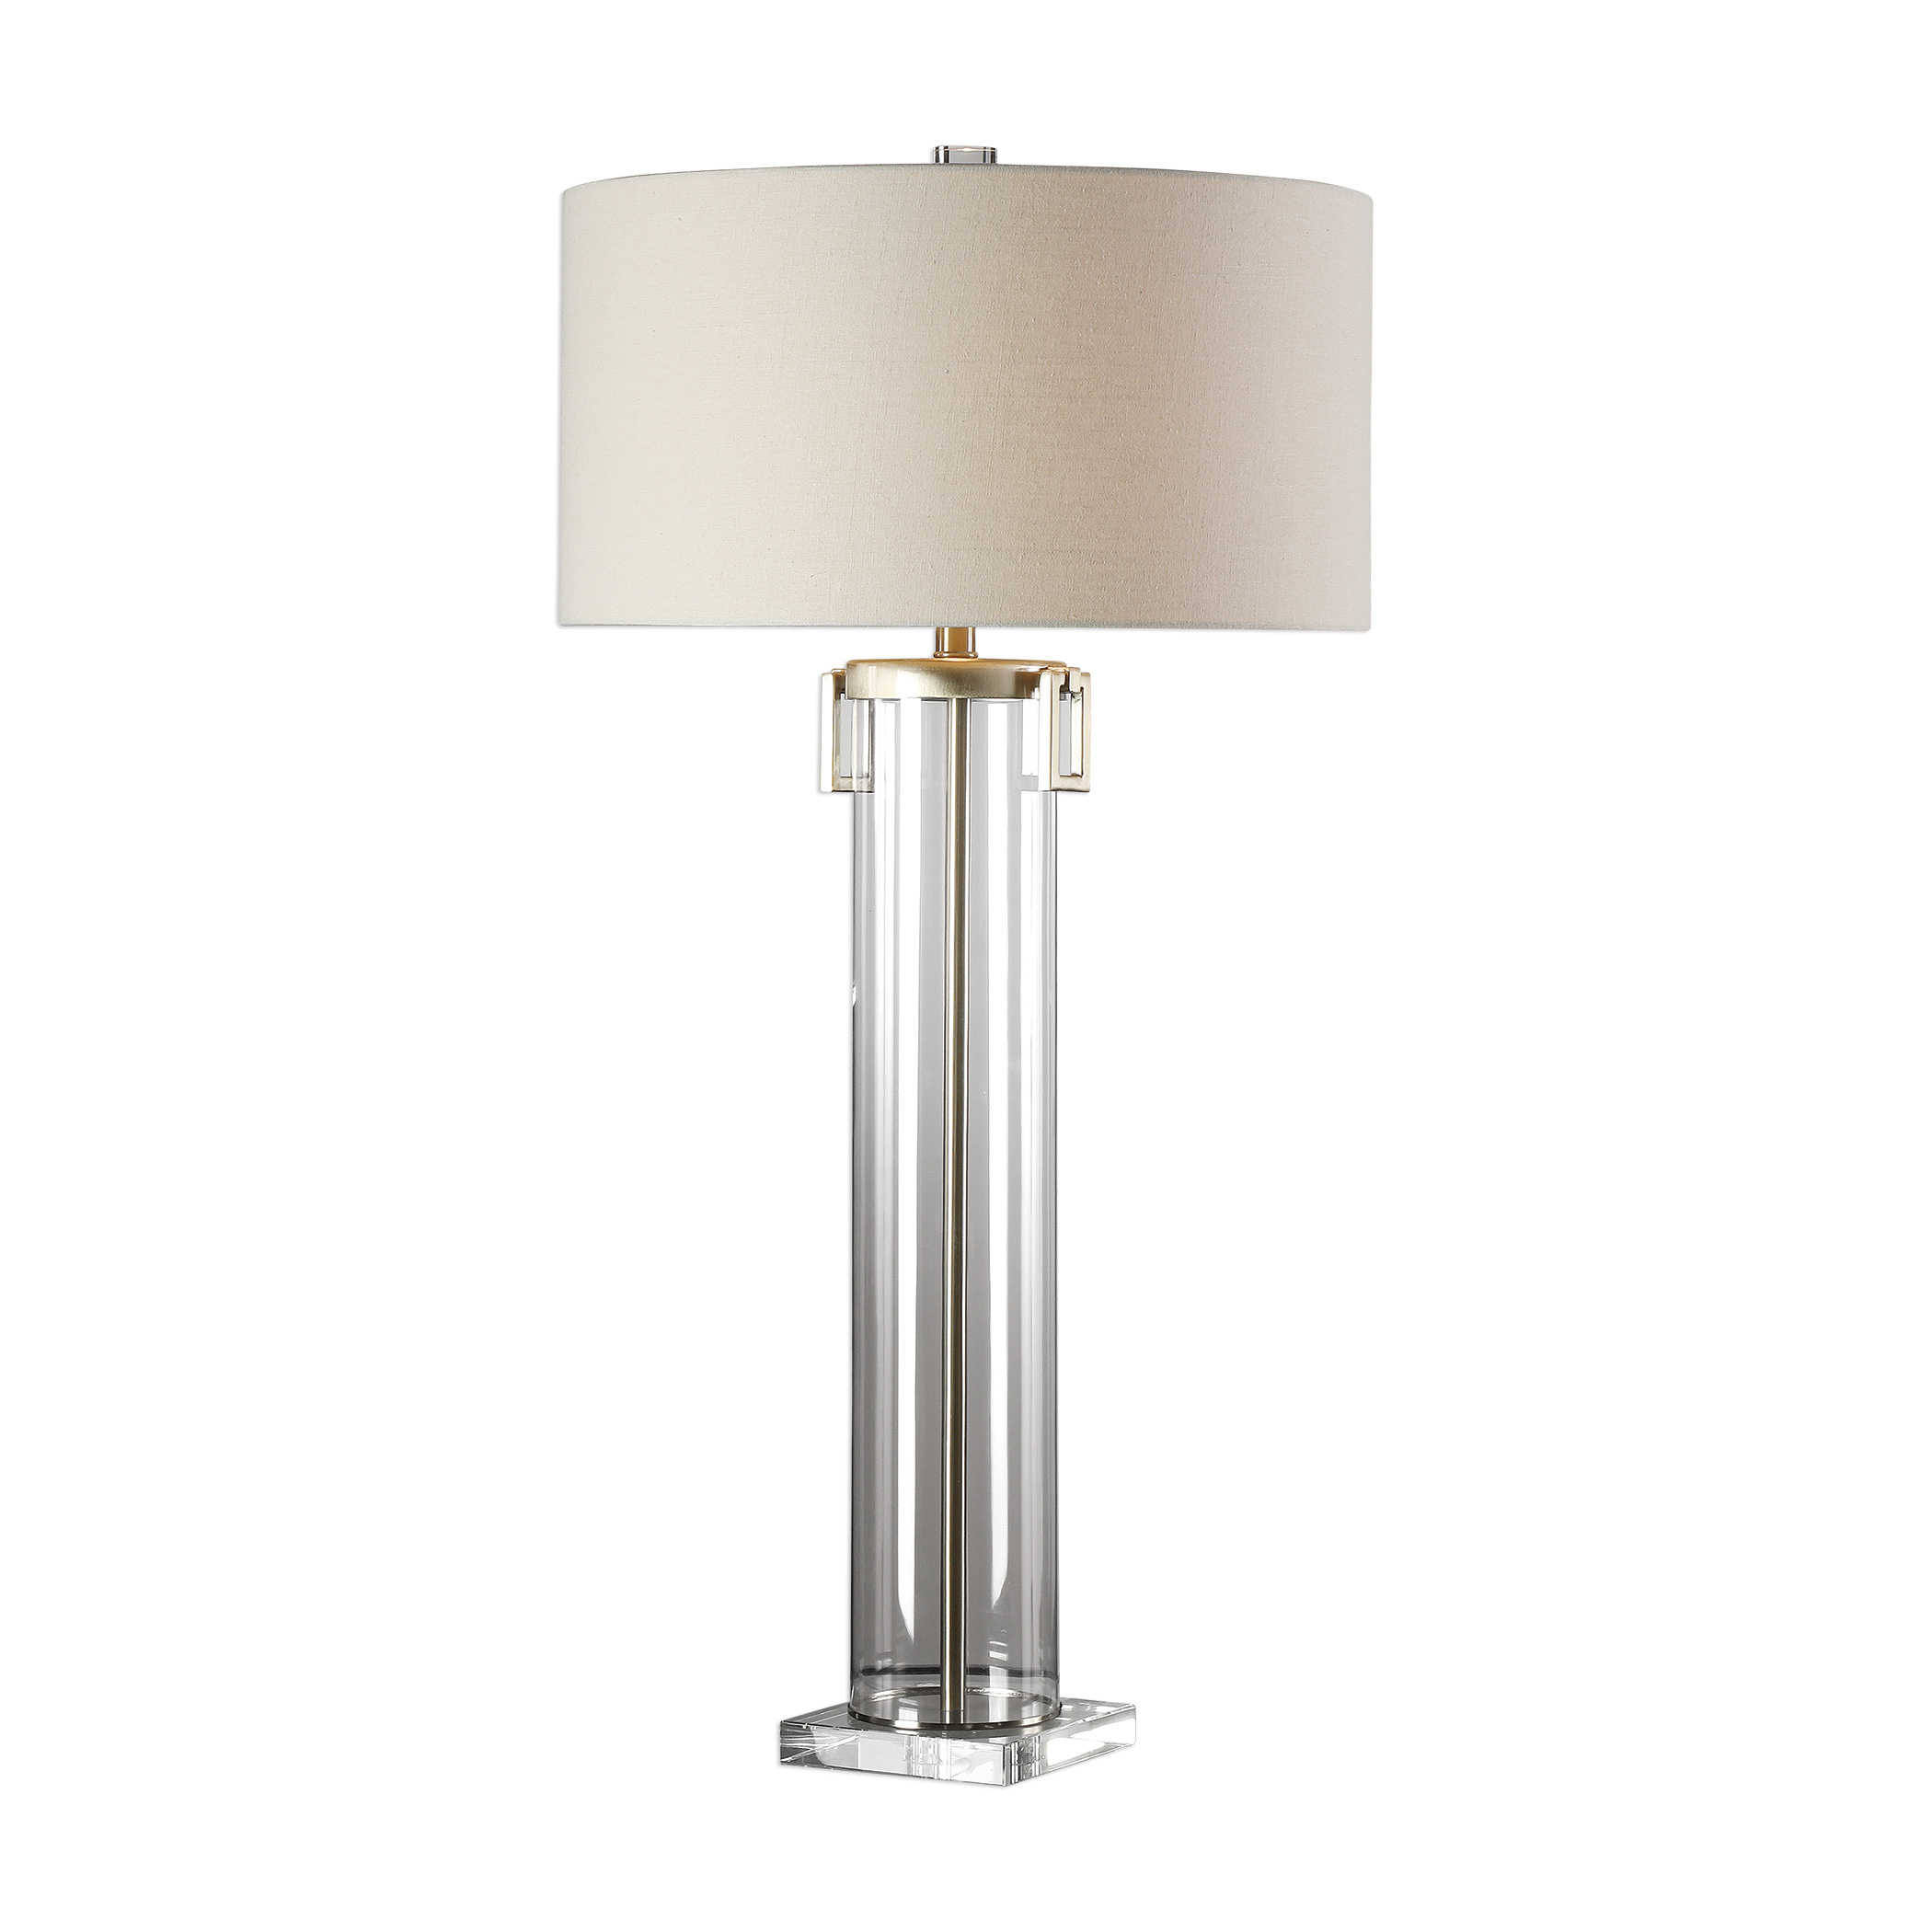 Tall Acrylic Lamp